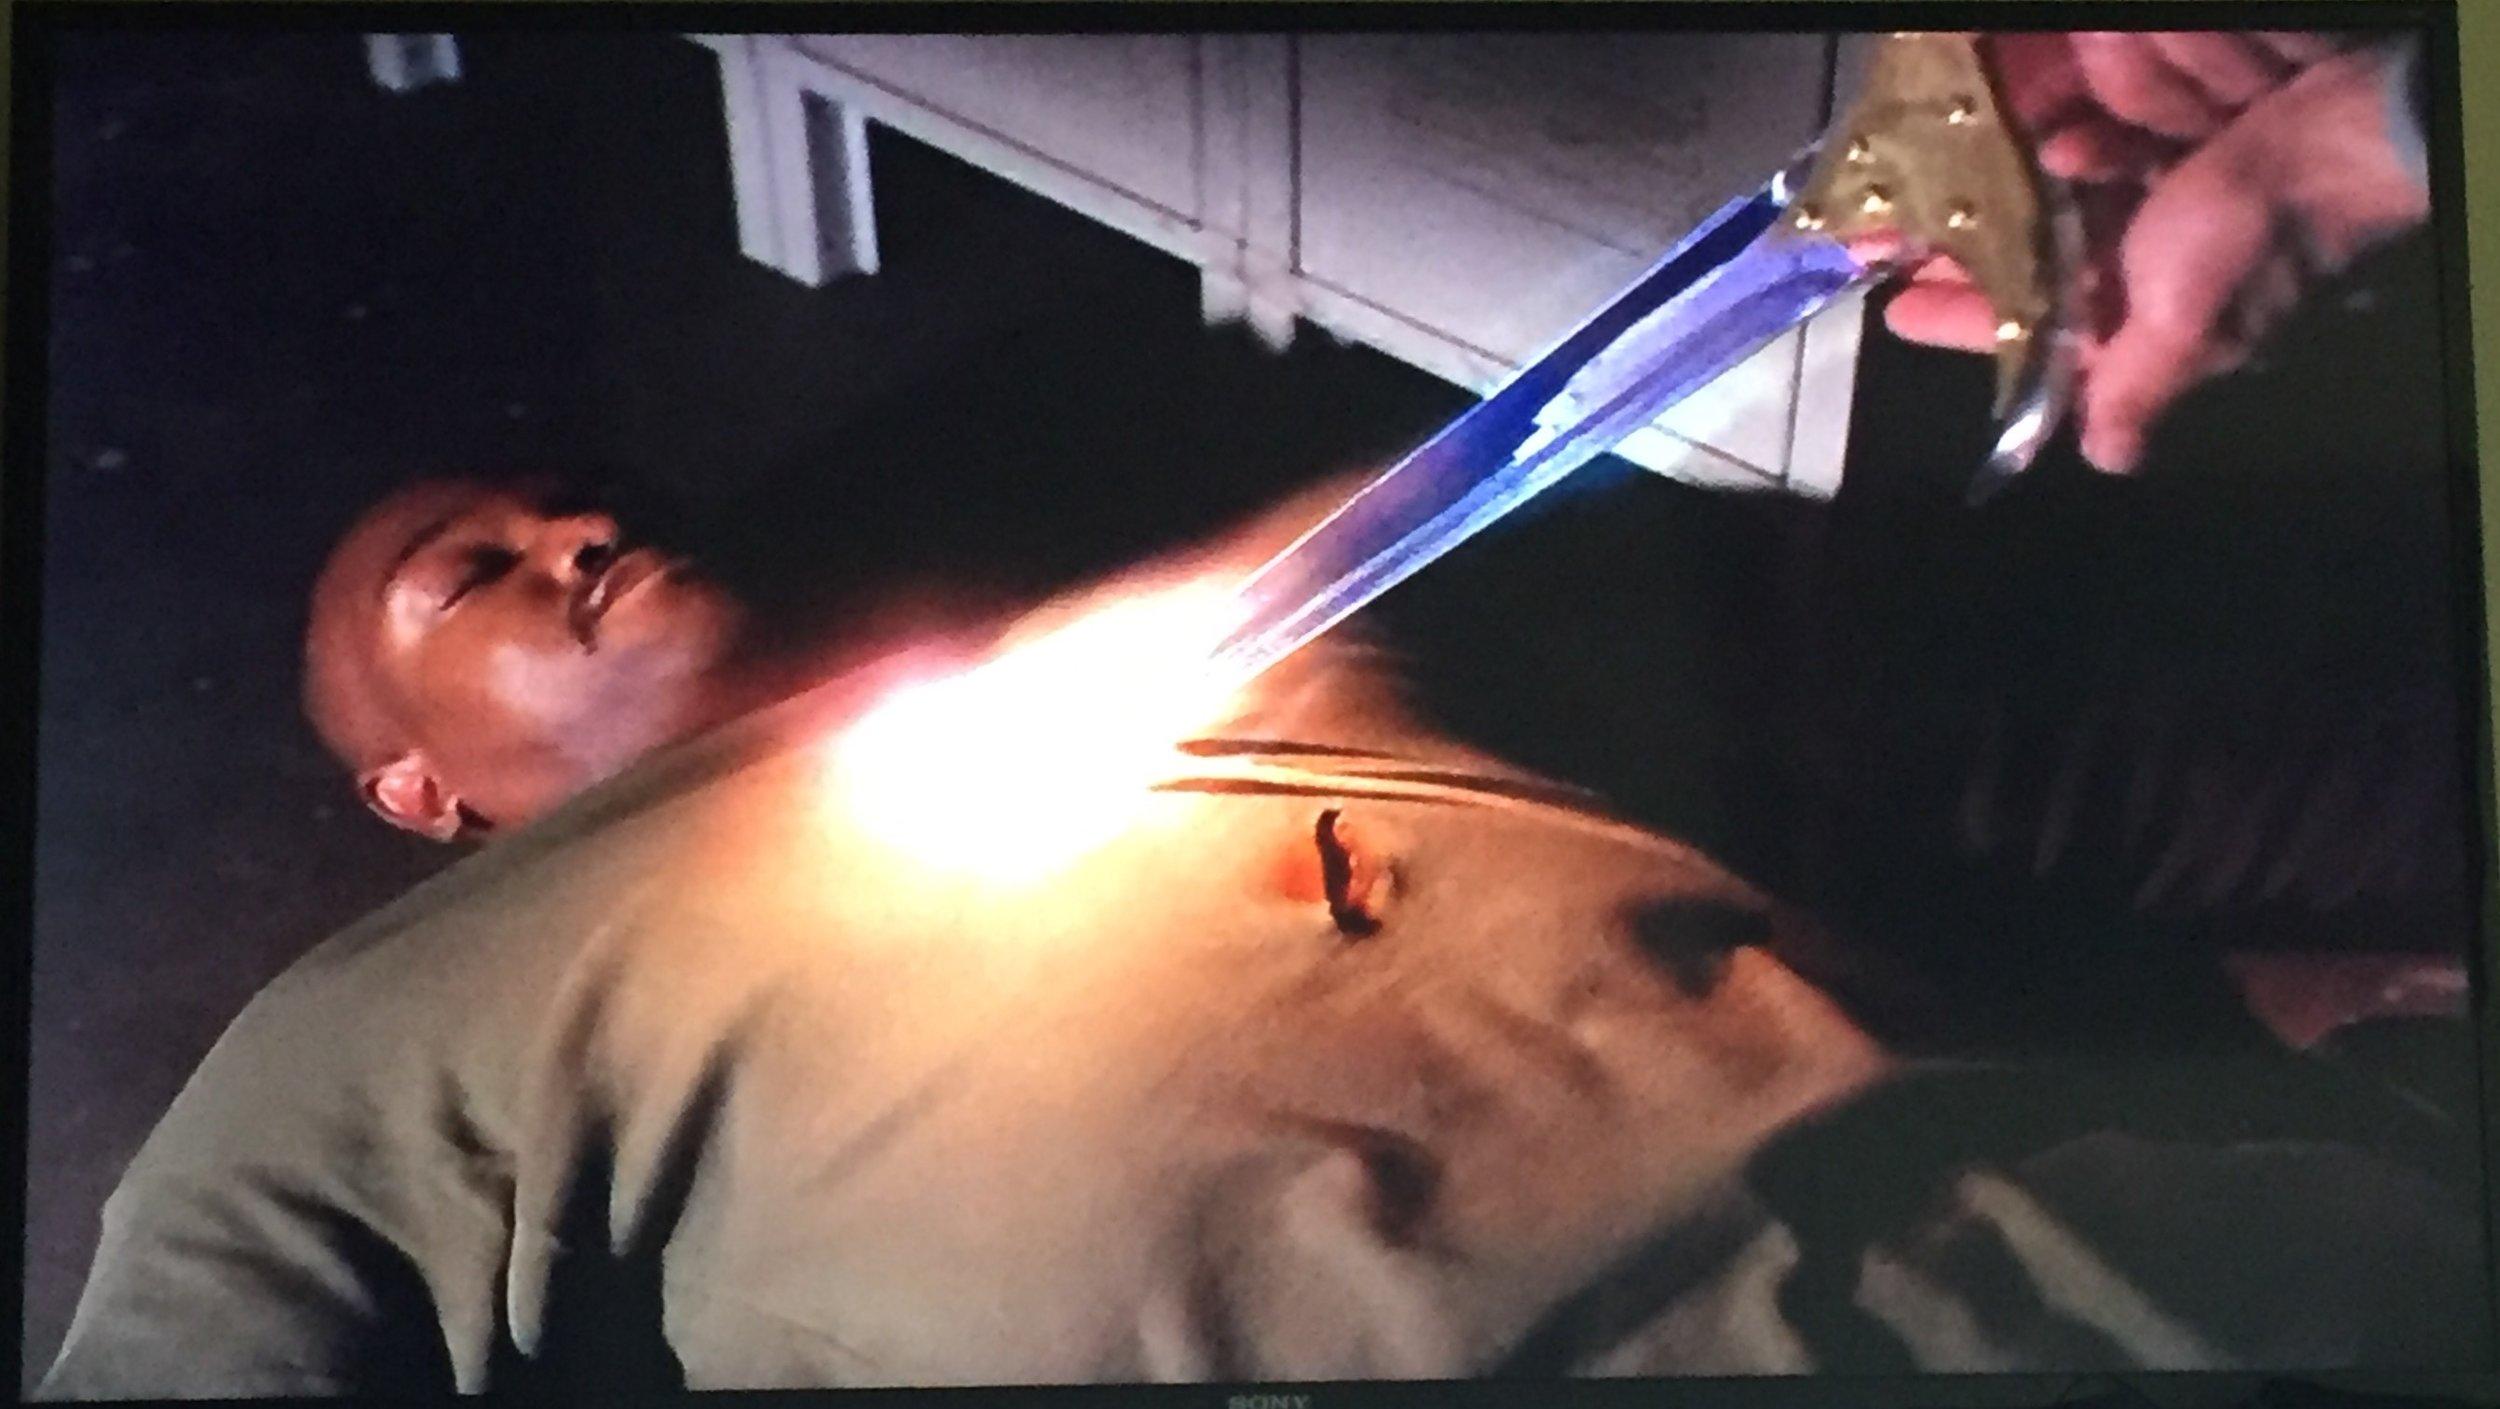 Gotta love a glowing sword!